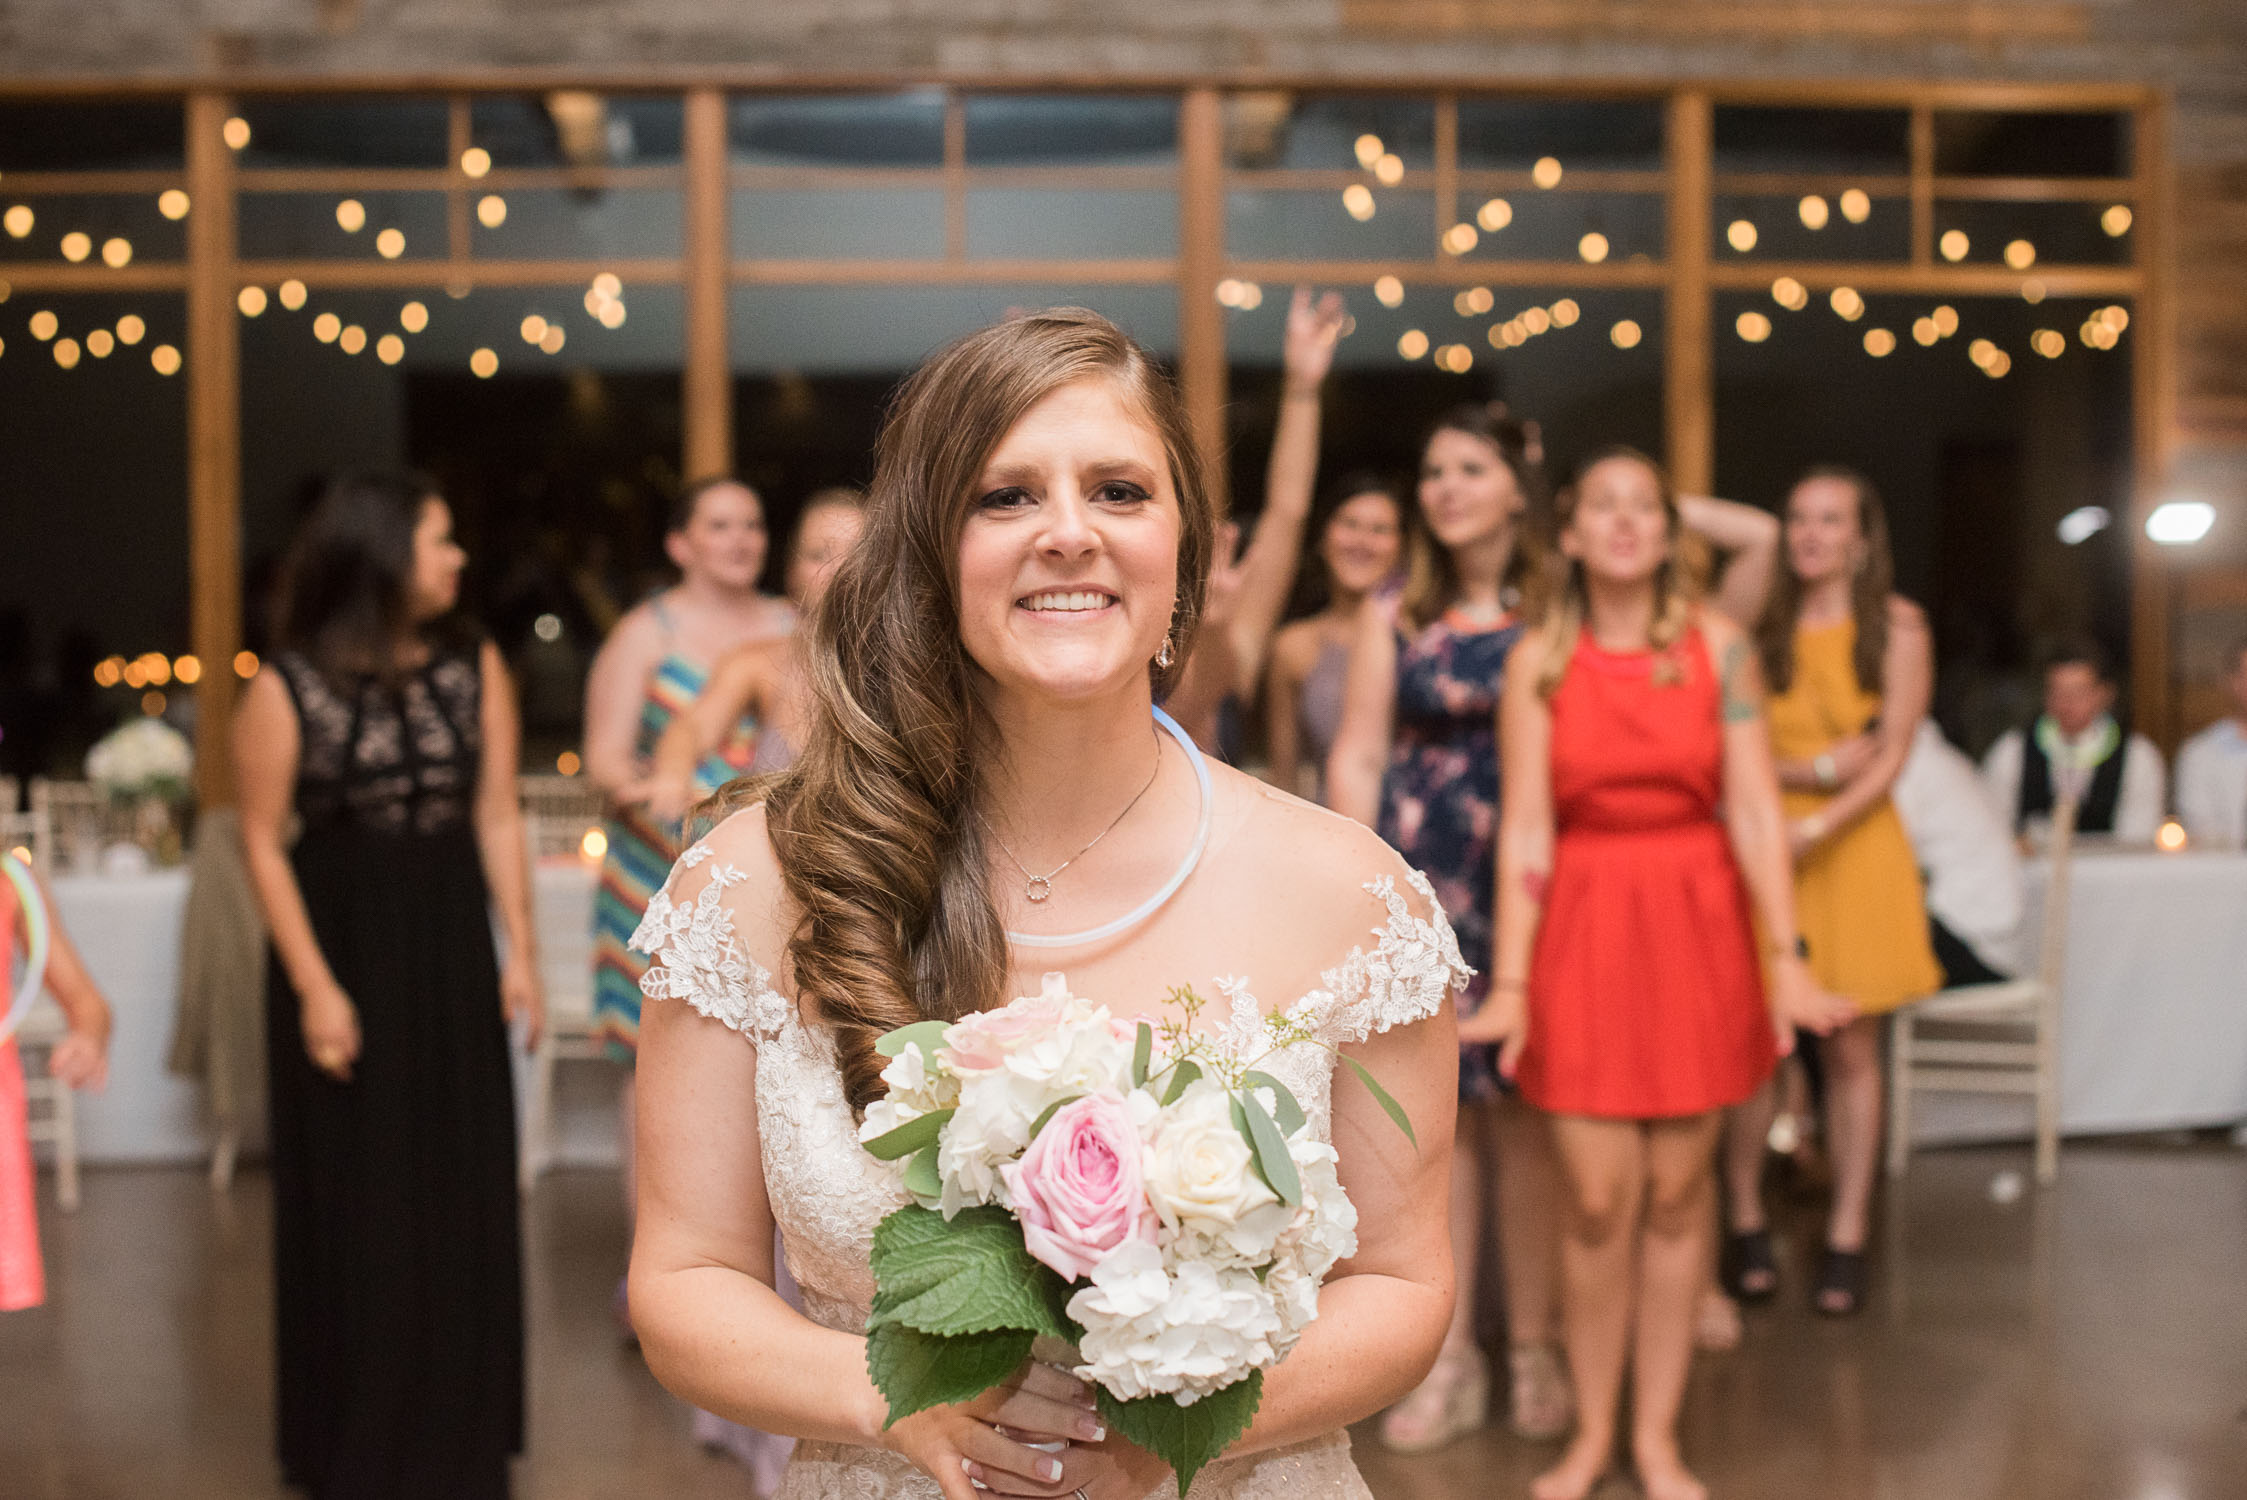 Hinton Wedding at Canyonwood Ridge Dripping Springs Texas Wedding Photography-188.jpg